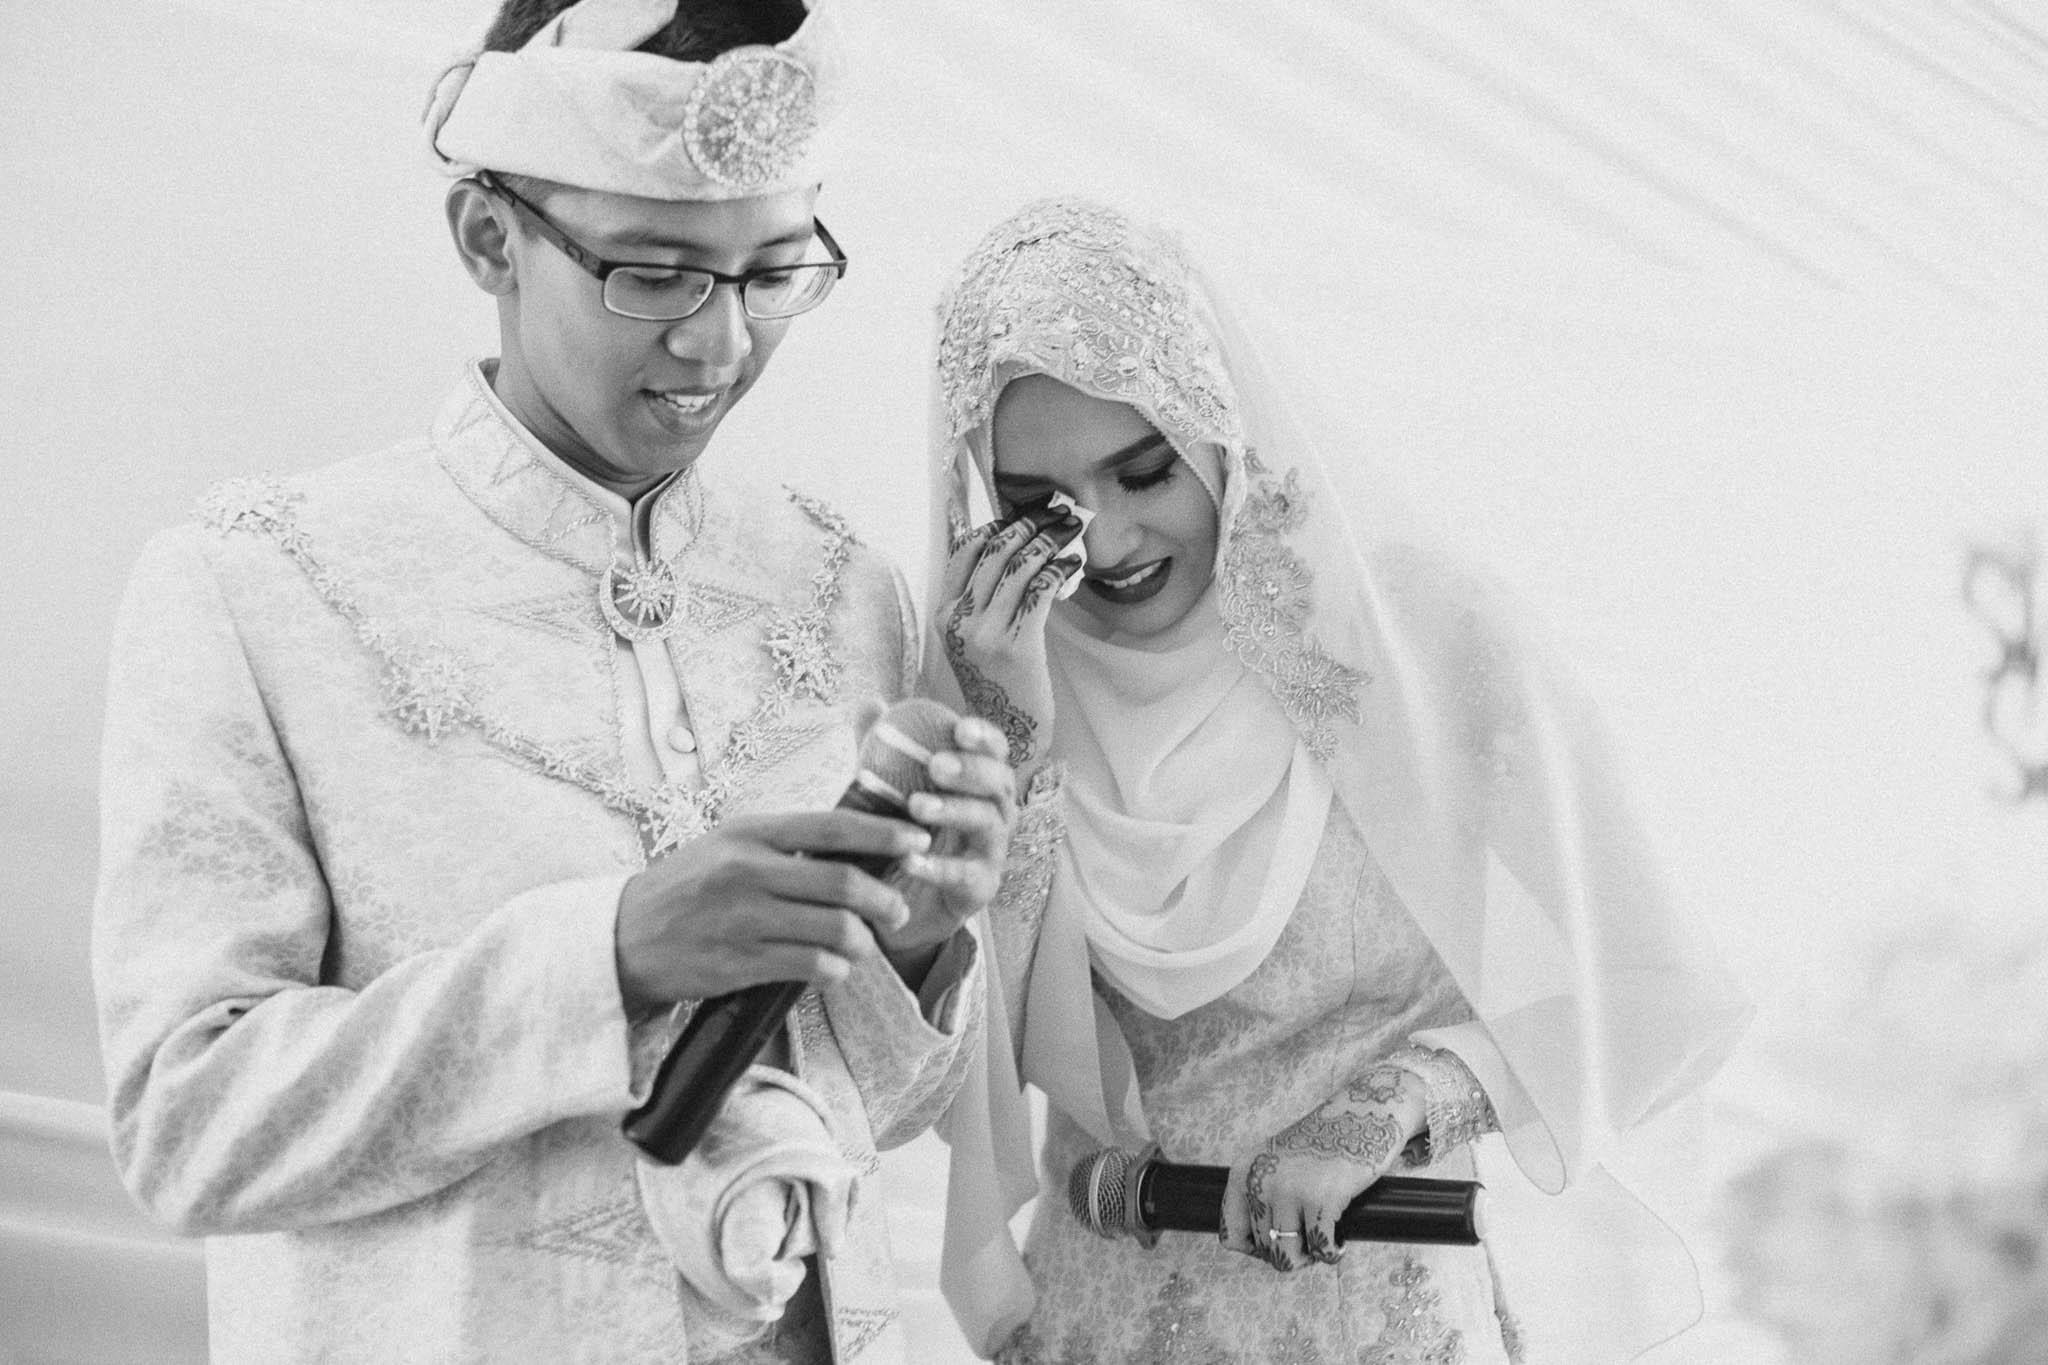 singapore-wedding-photographer-sharalyn-syazwan-045.jpg